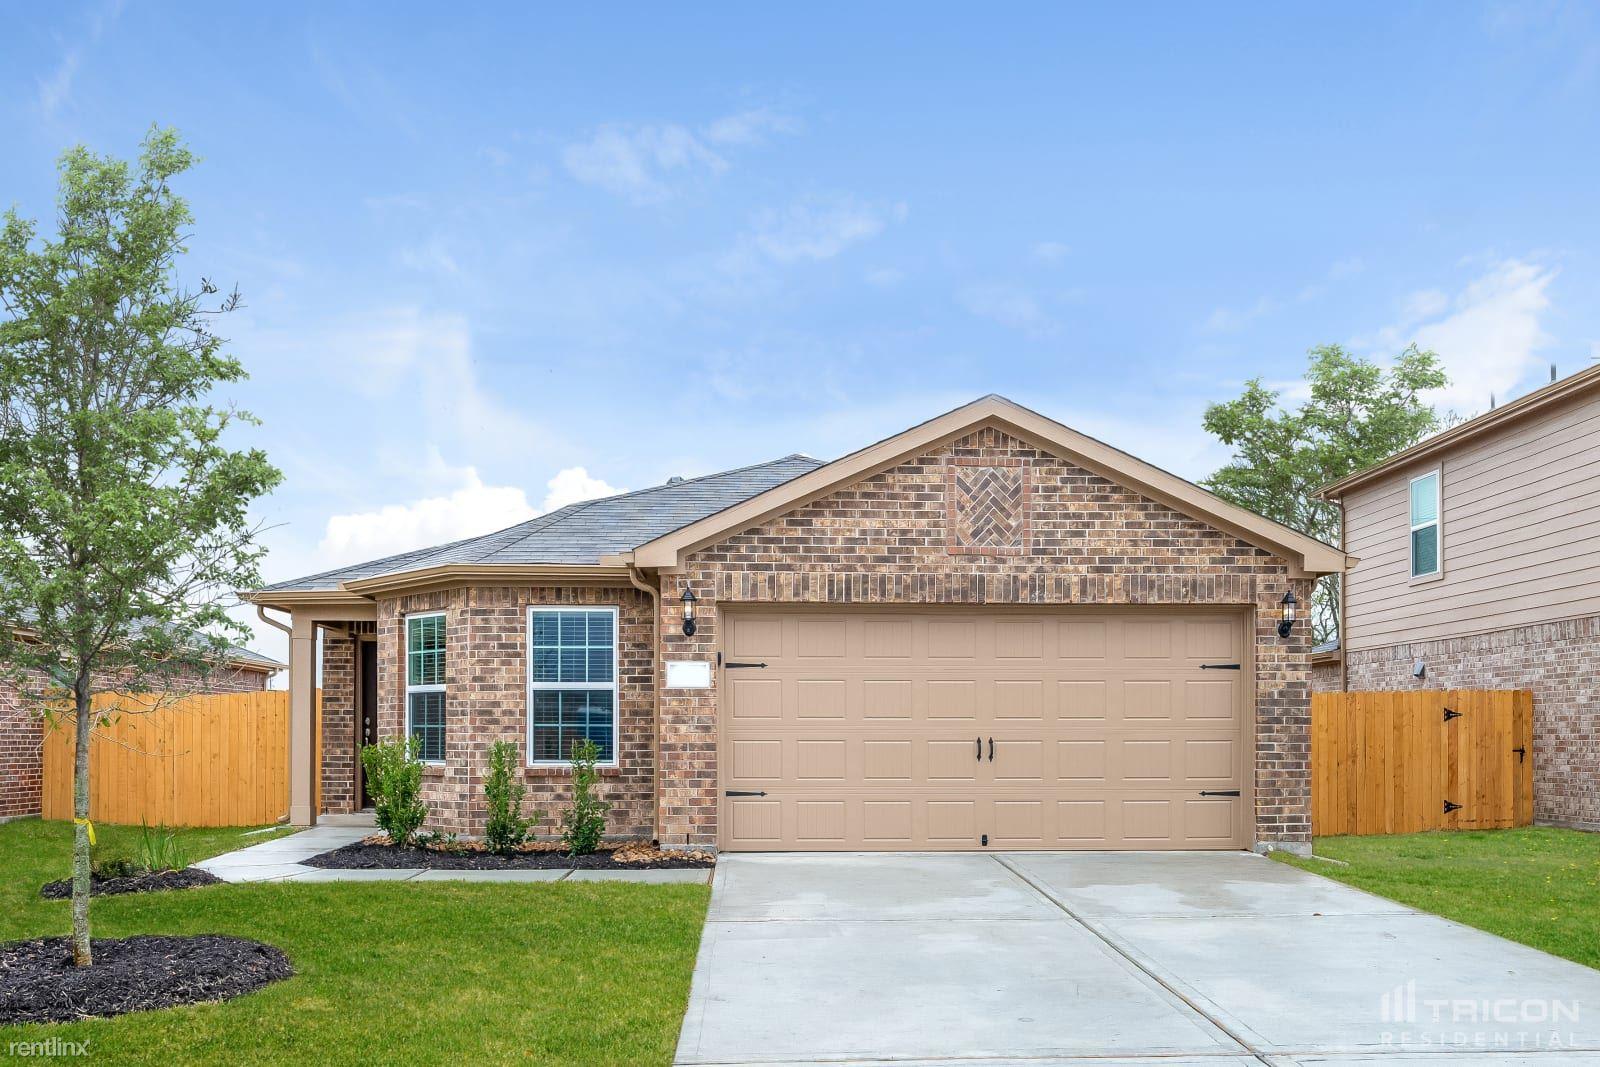 432 Palomino Stand Drive, La Marque, TX - $1,775 USD/ month